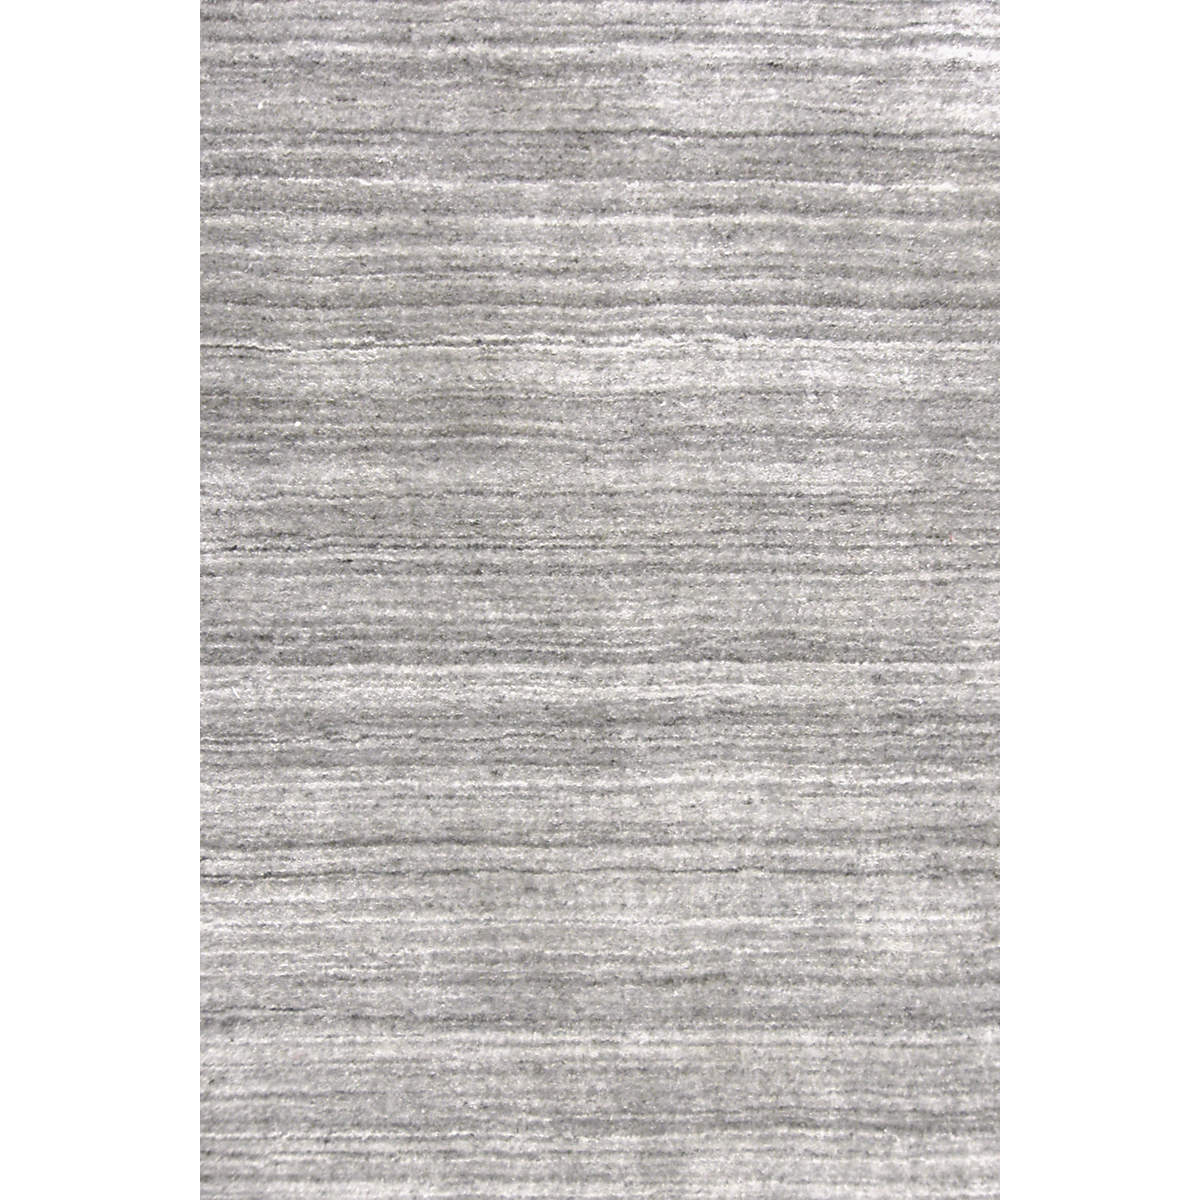 Grey rugs icelandia grey hand knotted rug | dash u0026 albert QKBGBVR